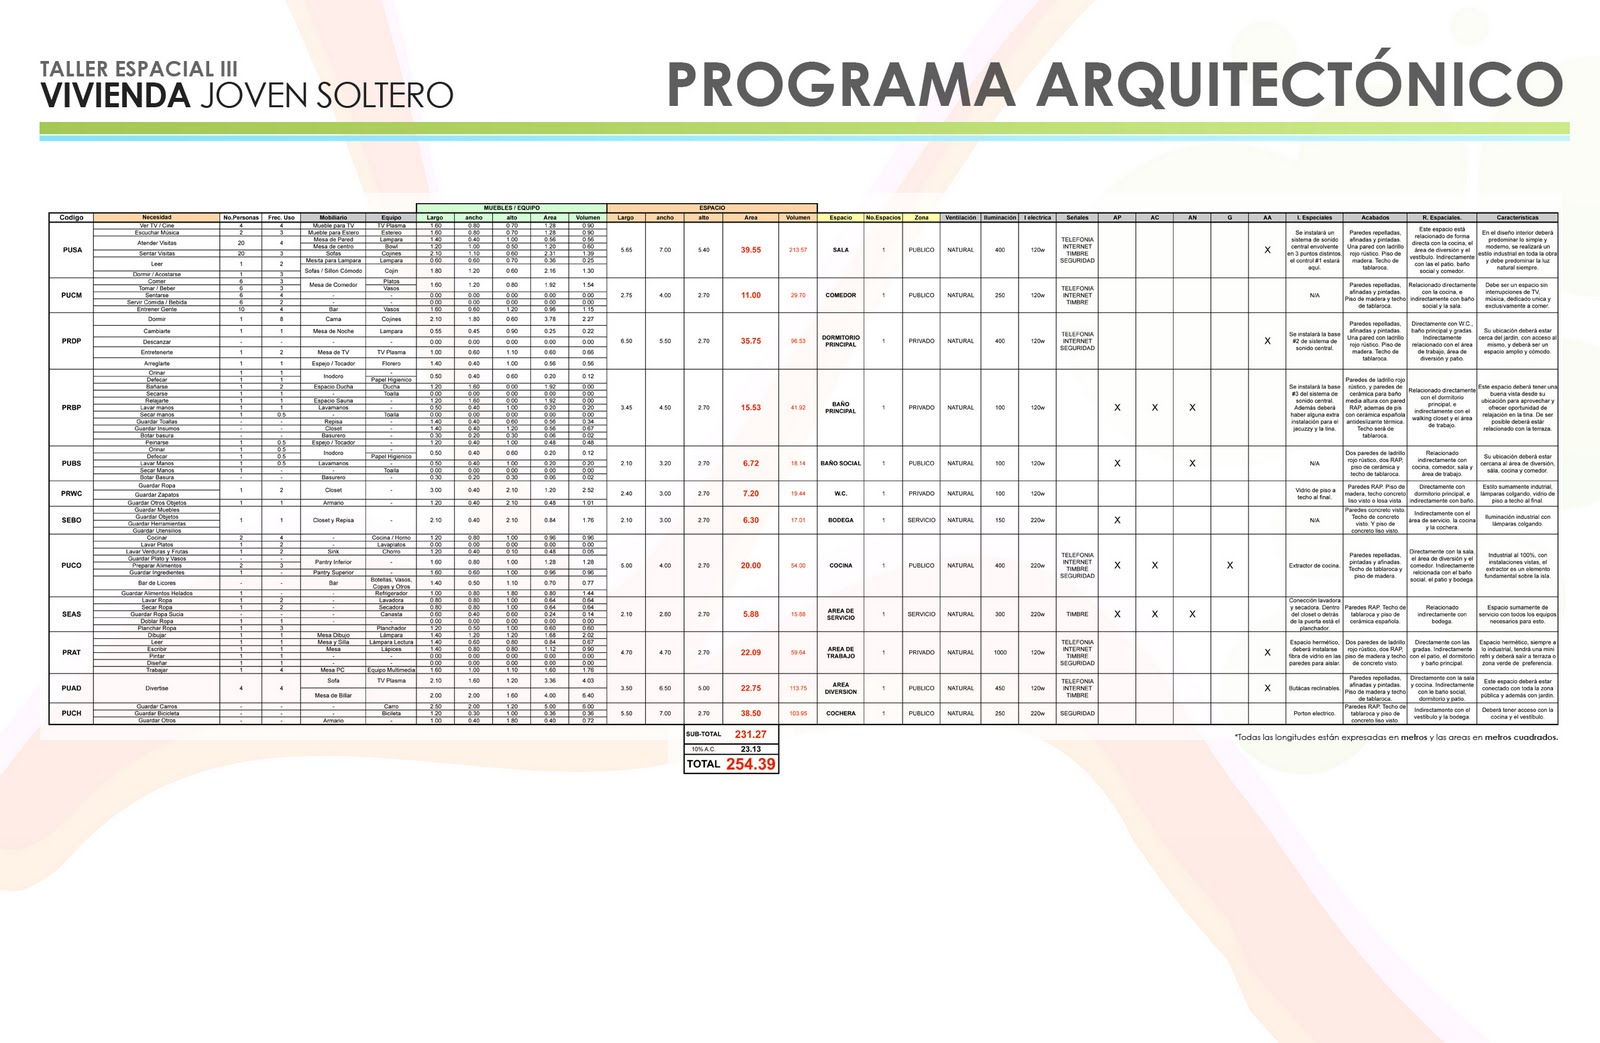 t a l l e r d z i s h i 2 0 1 1 programa arquitectonico